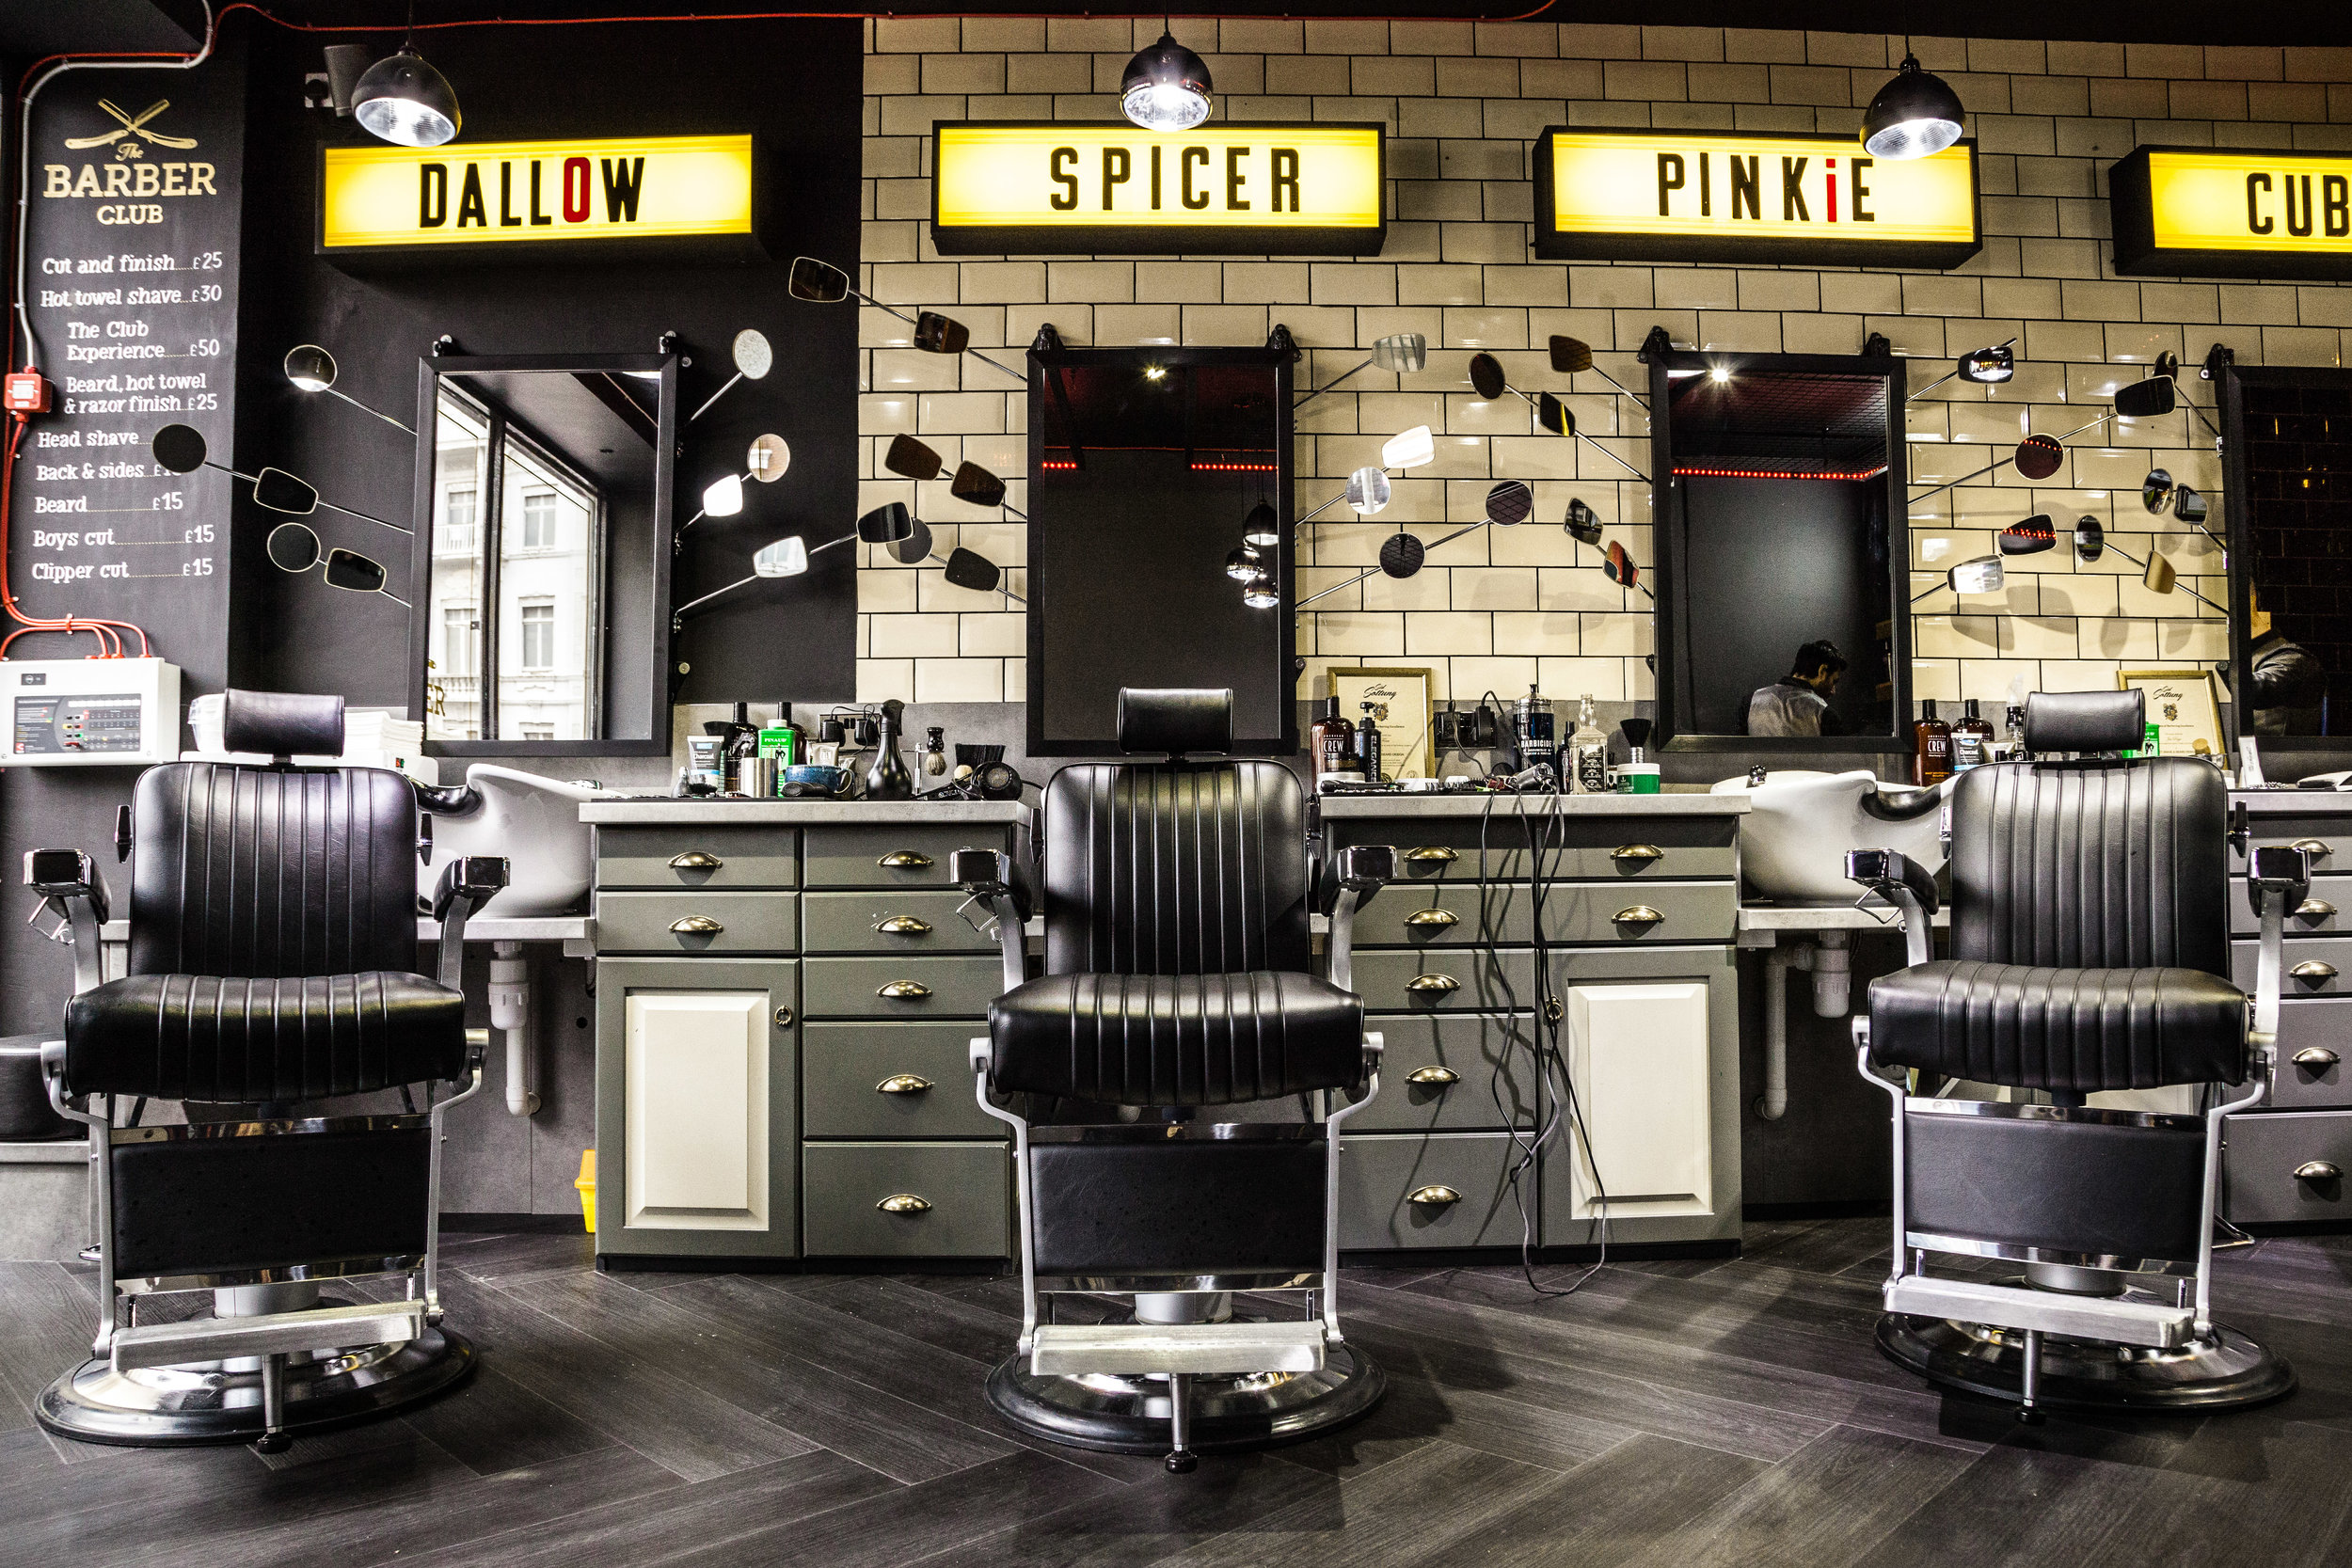 Barber club chairs